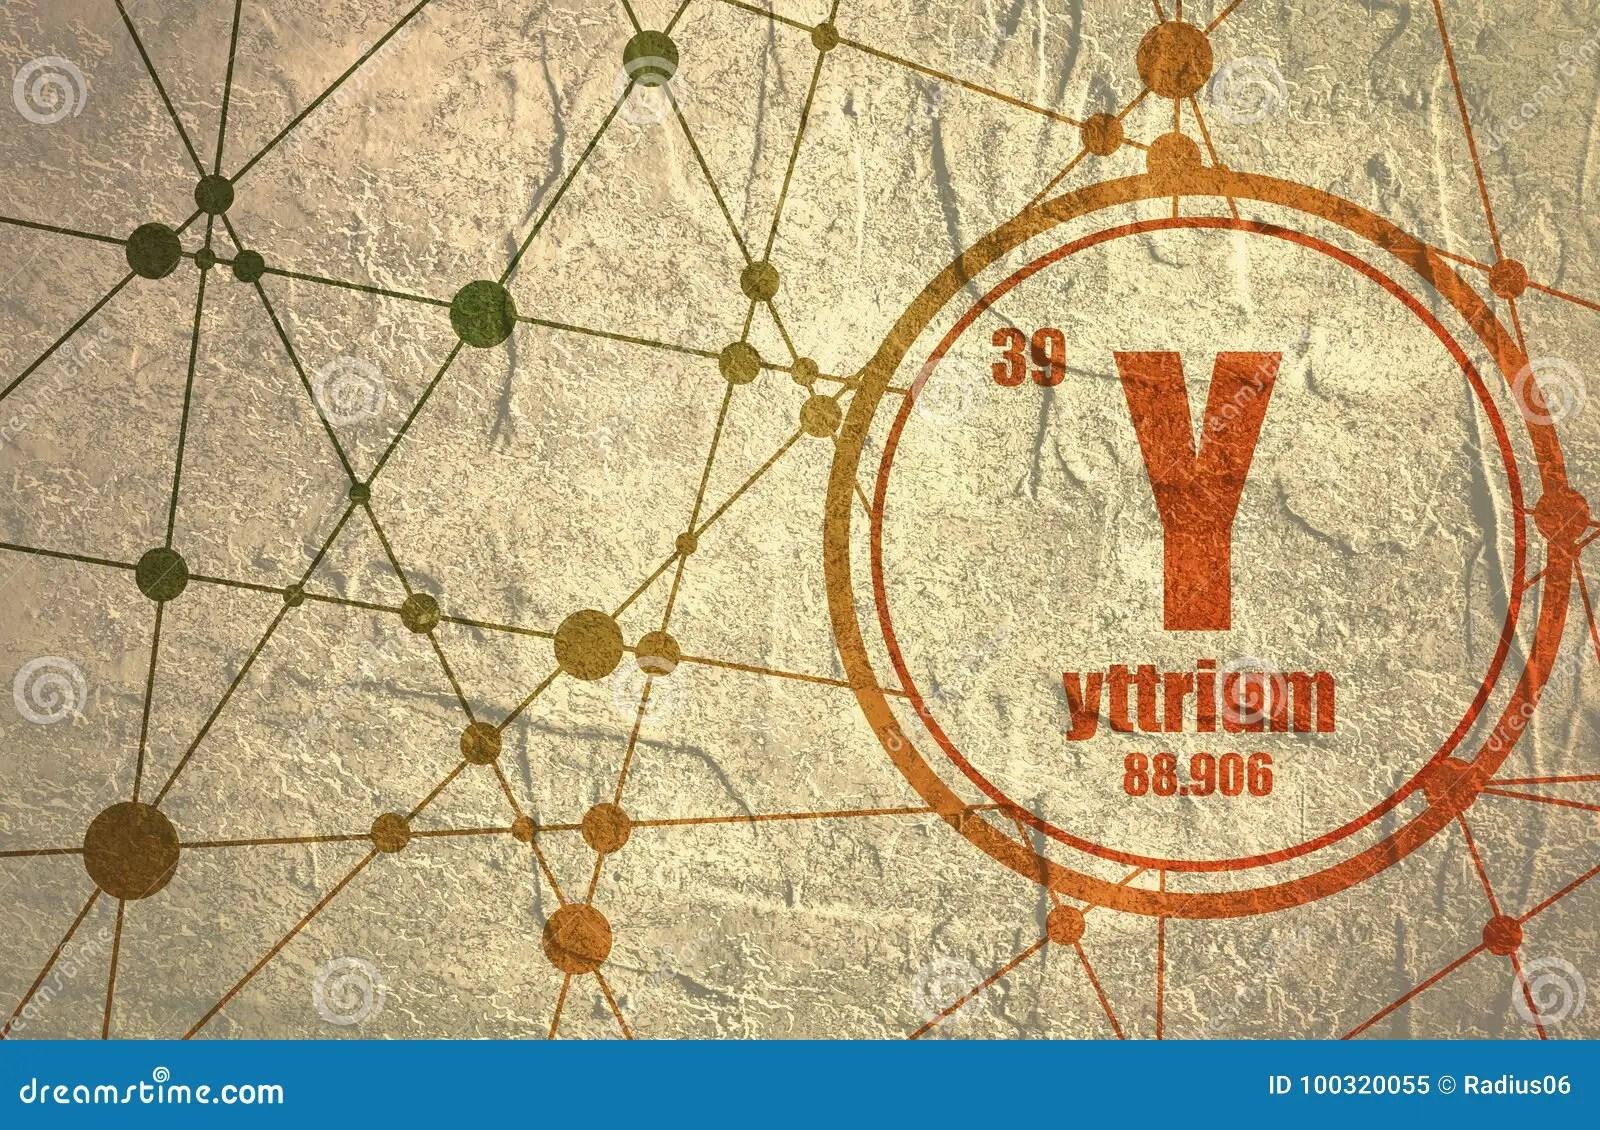 hight resolution of yttrium chemical element stock illustration illustration of school dot diagram carbon yttrium chemical element